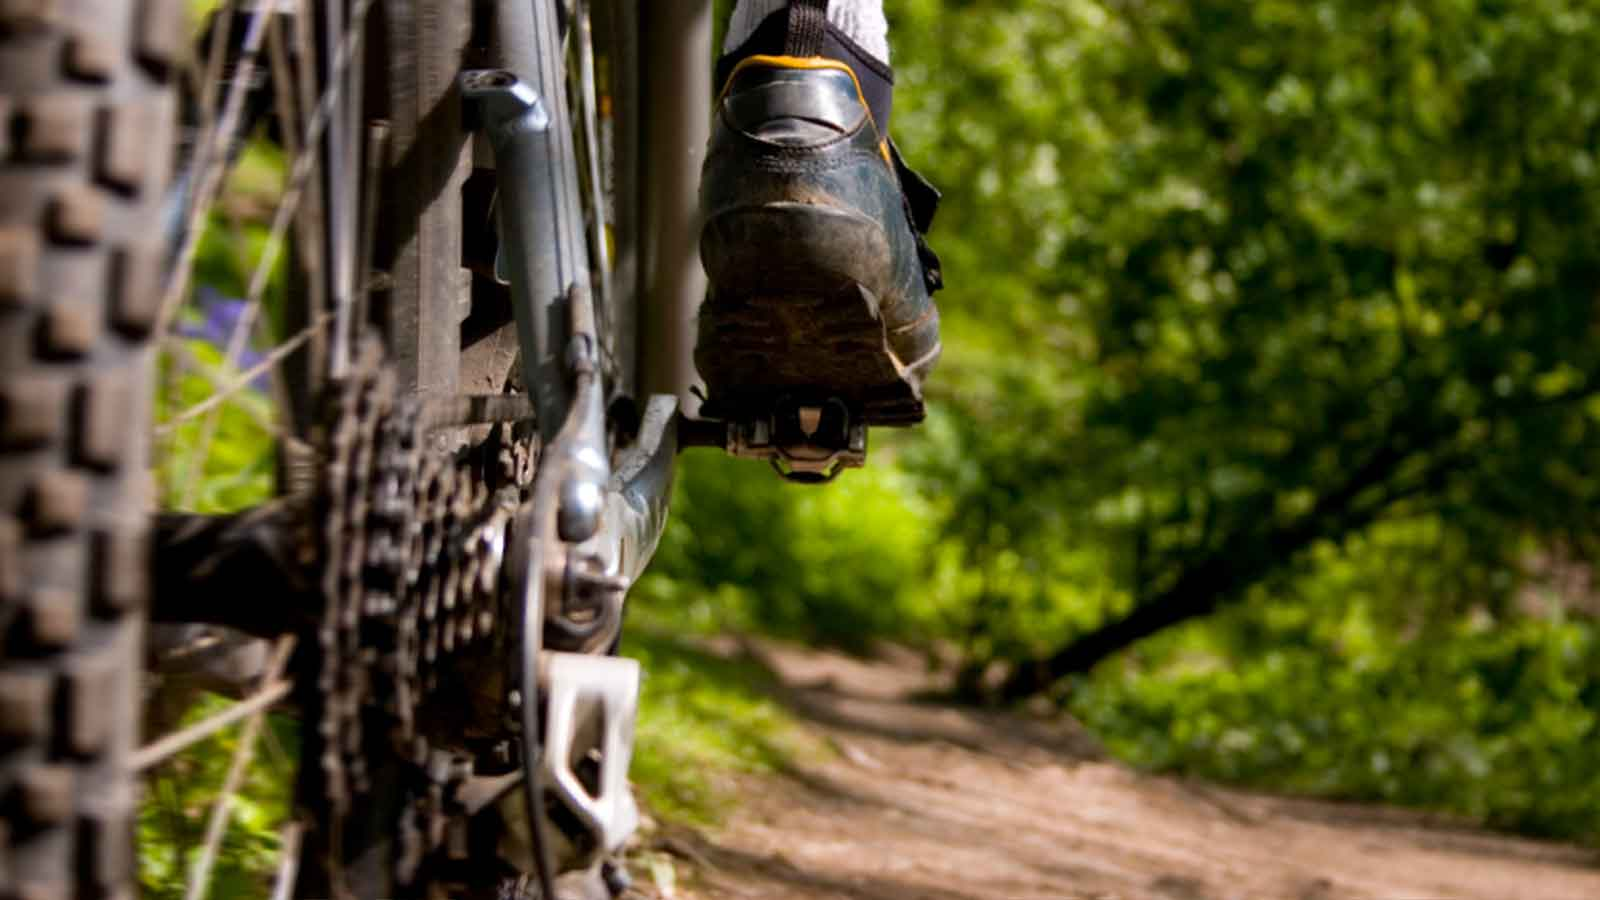 bike-bush2